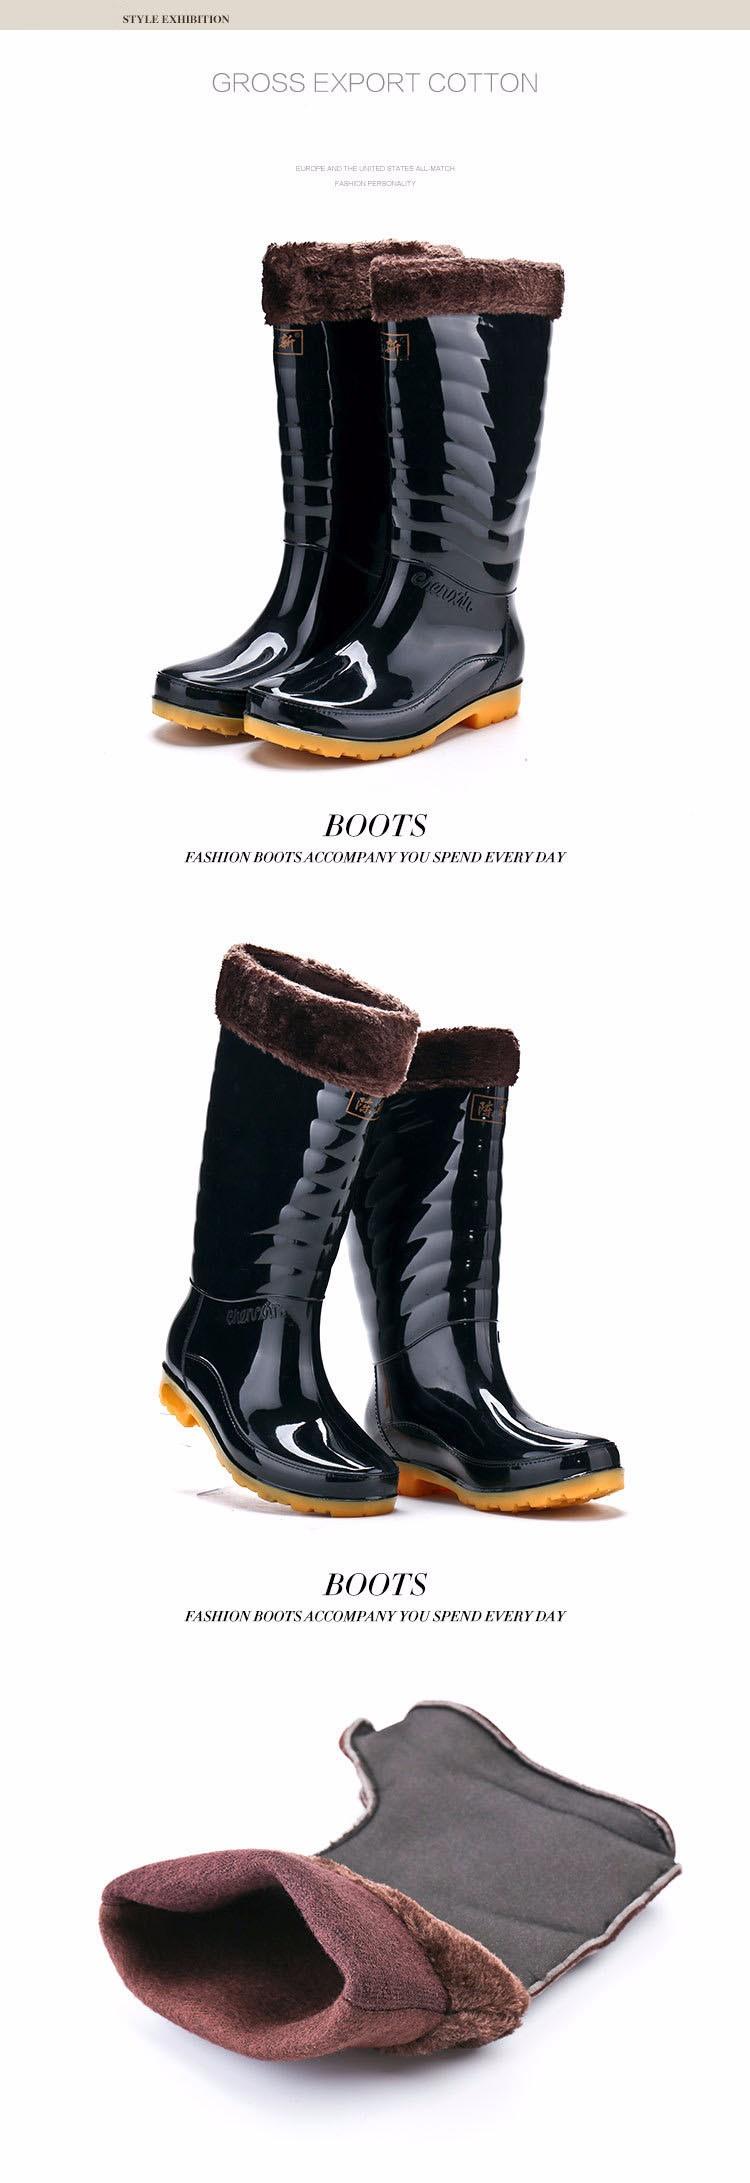 Hellozebra Men Fashion Rain Boots All Seasons Black Chains Waterproof  Welly Plaid Knee-High Rainboots 2016 New Fashion Design (7)